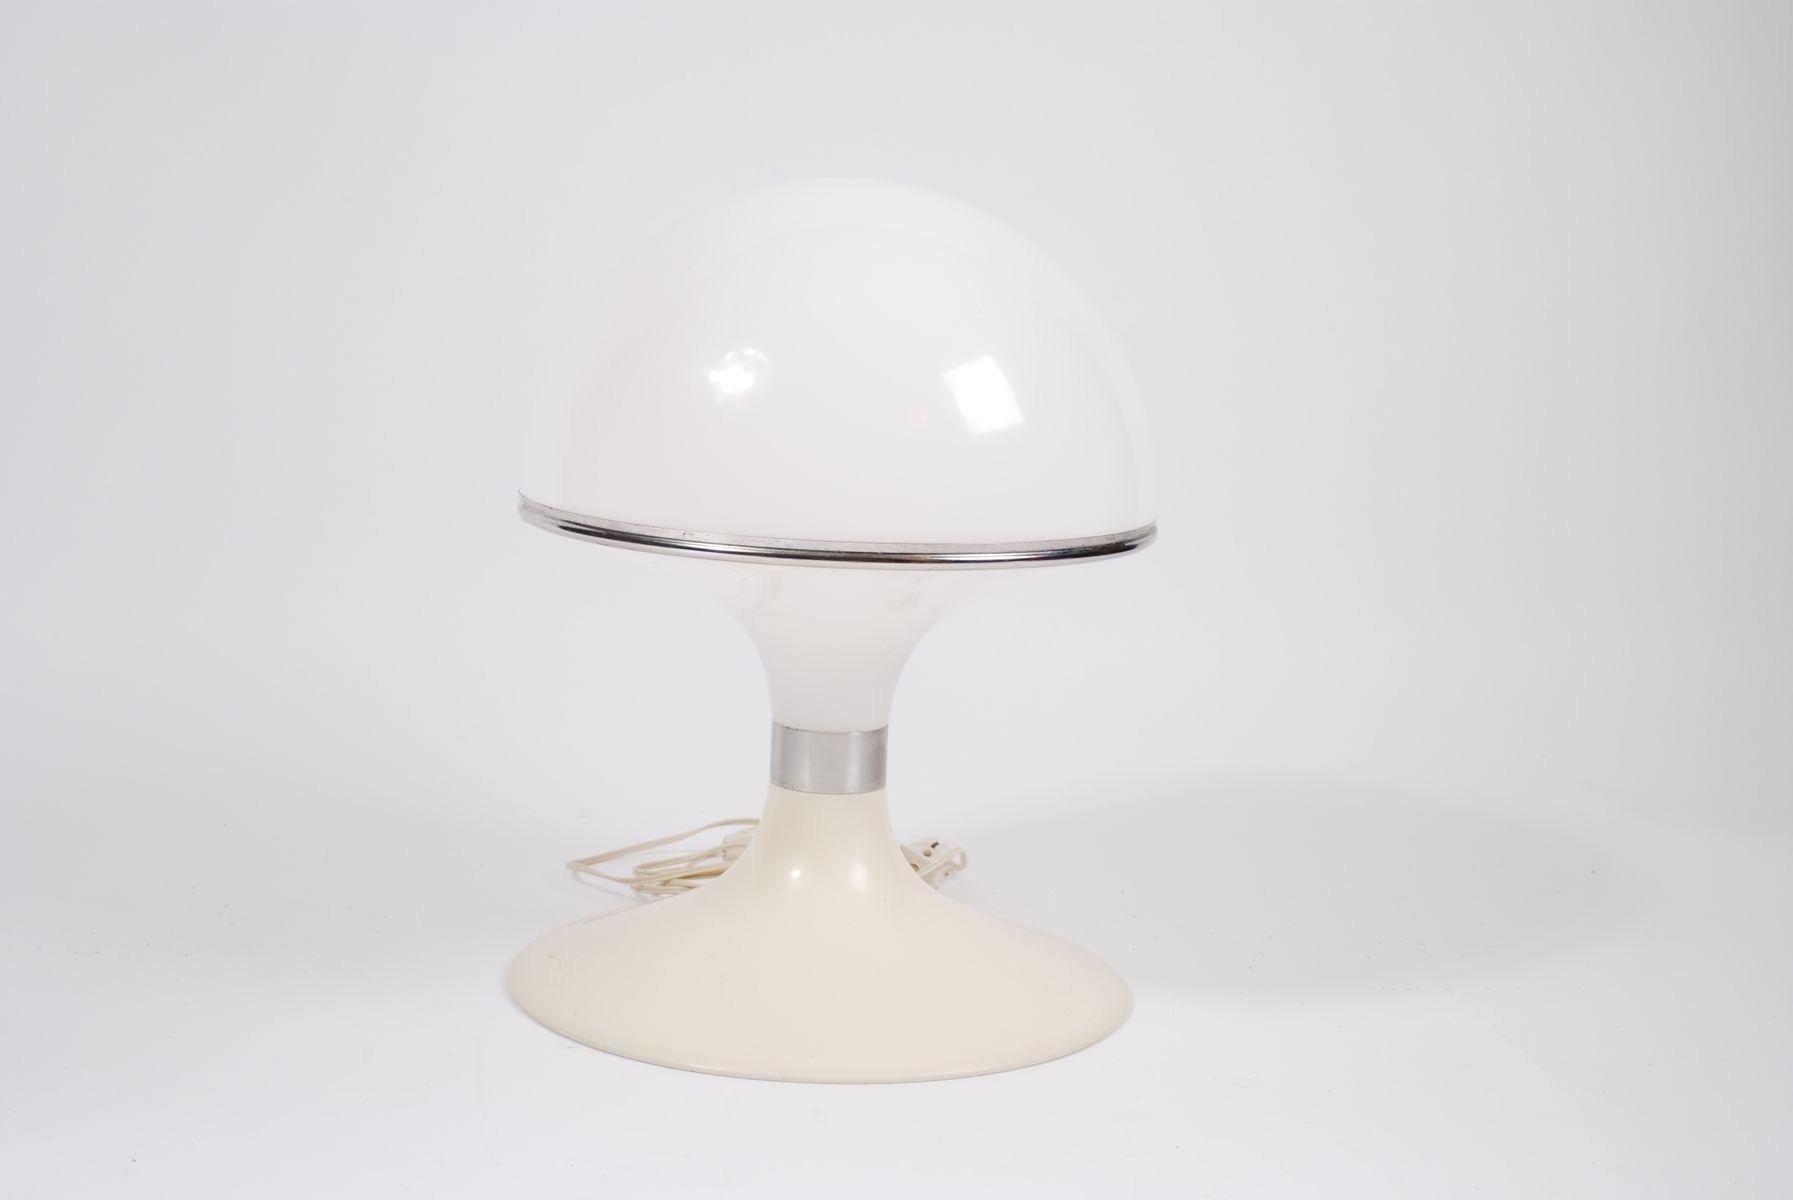 led tischlampe  designer tischlampe glas  tischlampe